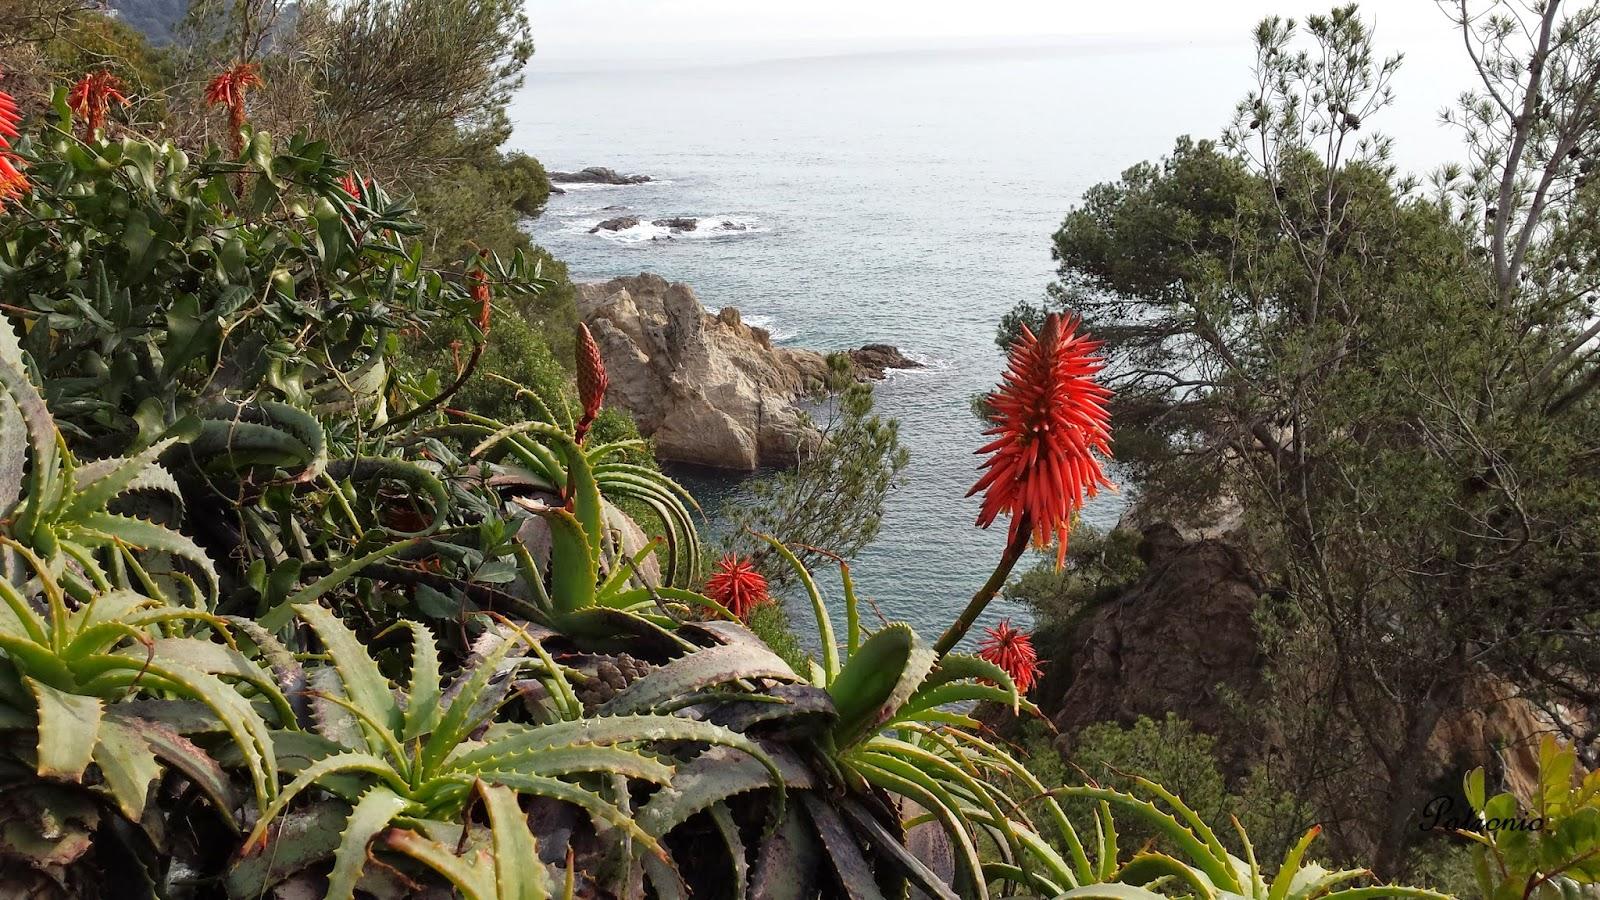 Patroniokayak: Jardines de Santa Clotilde. Lloret de Mar.